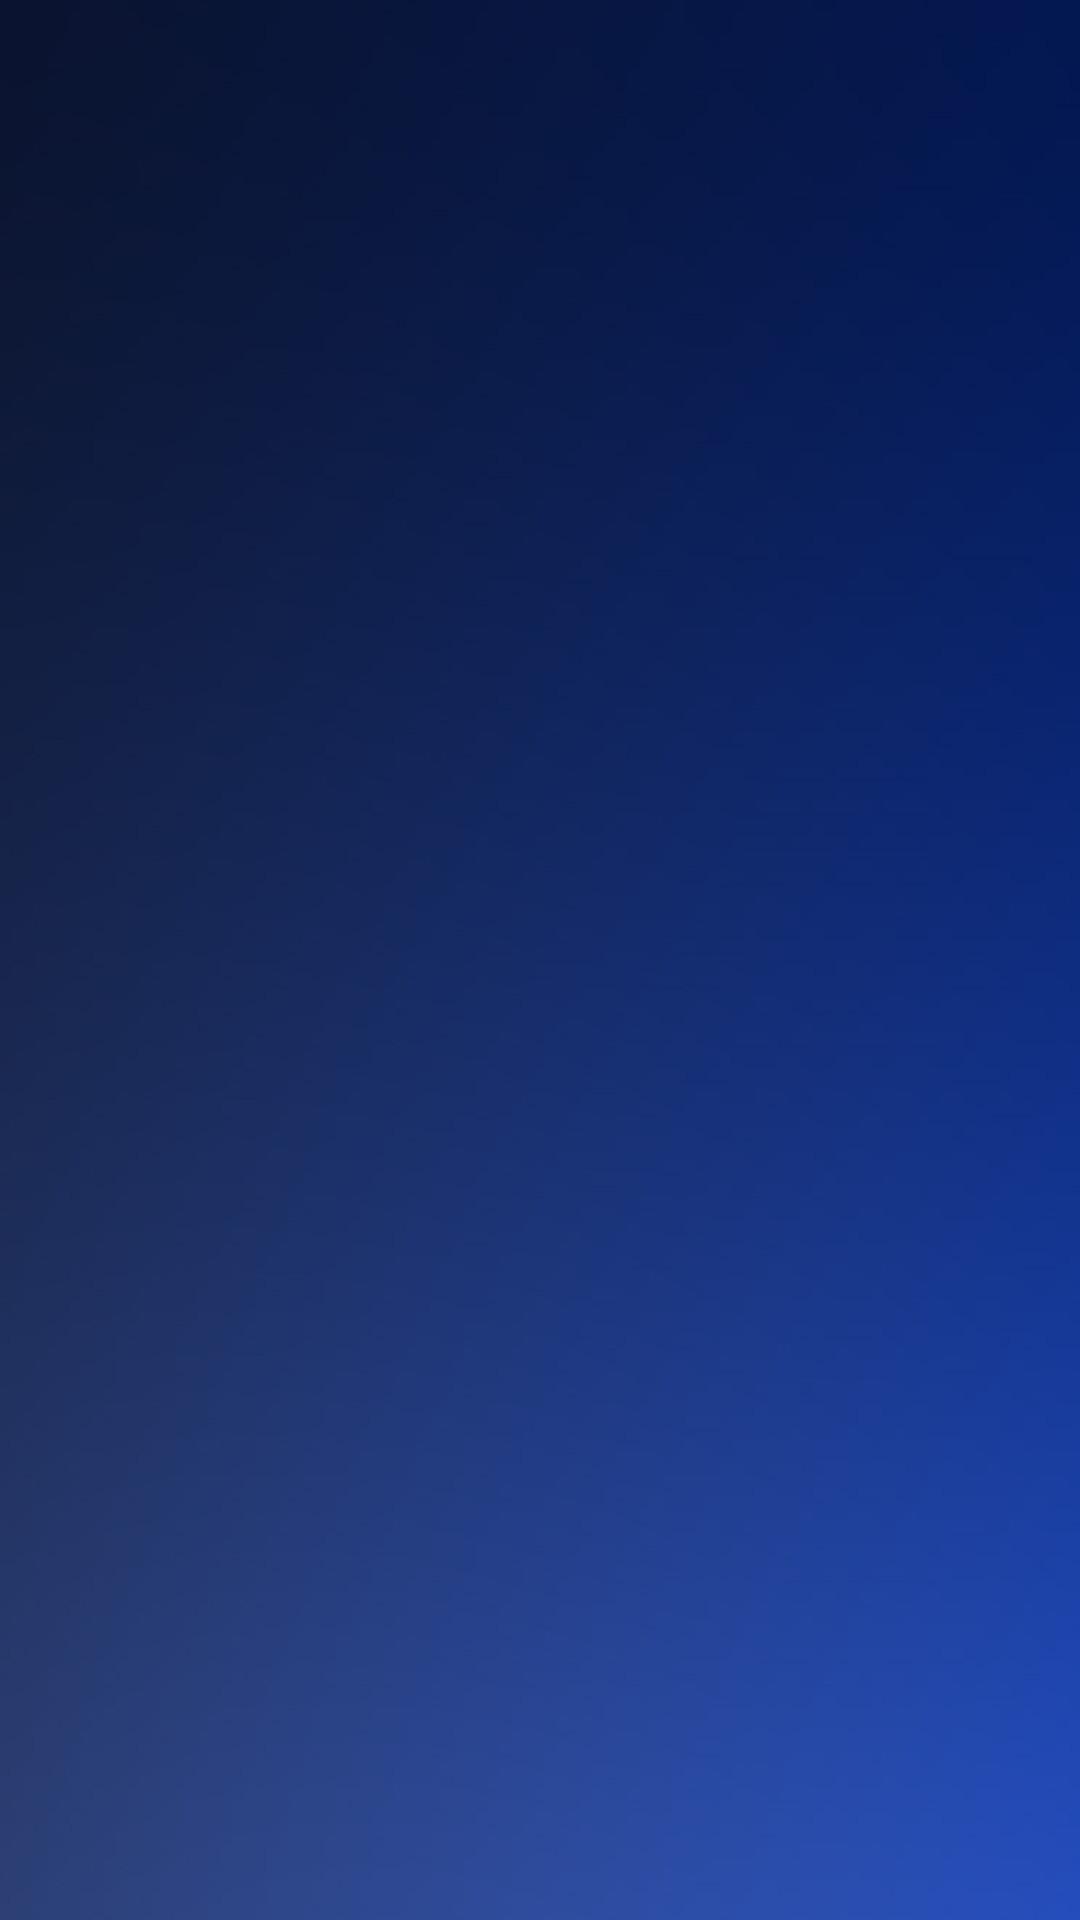 Plain Blue Background Wallpaper 1